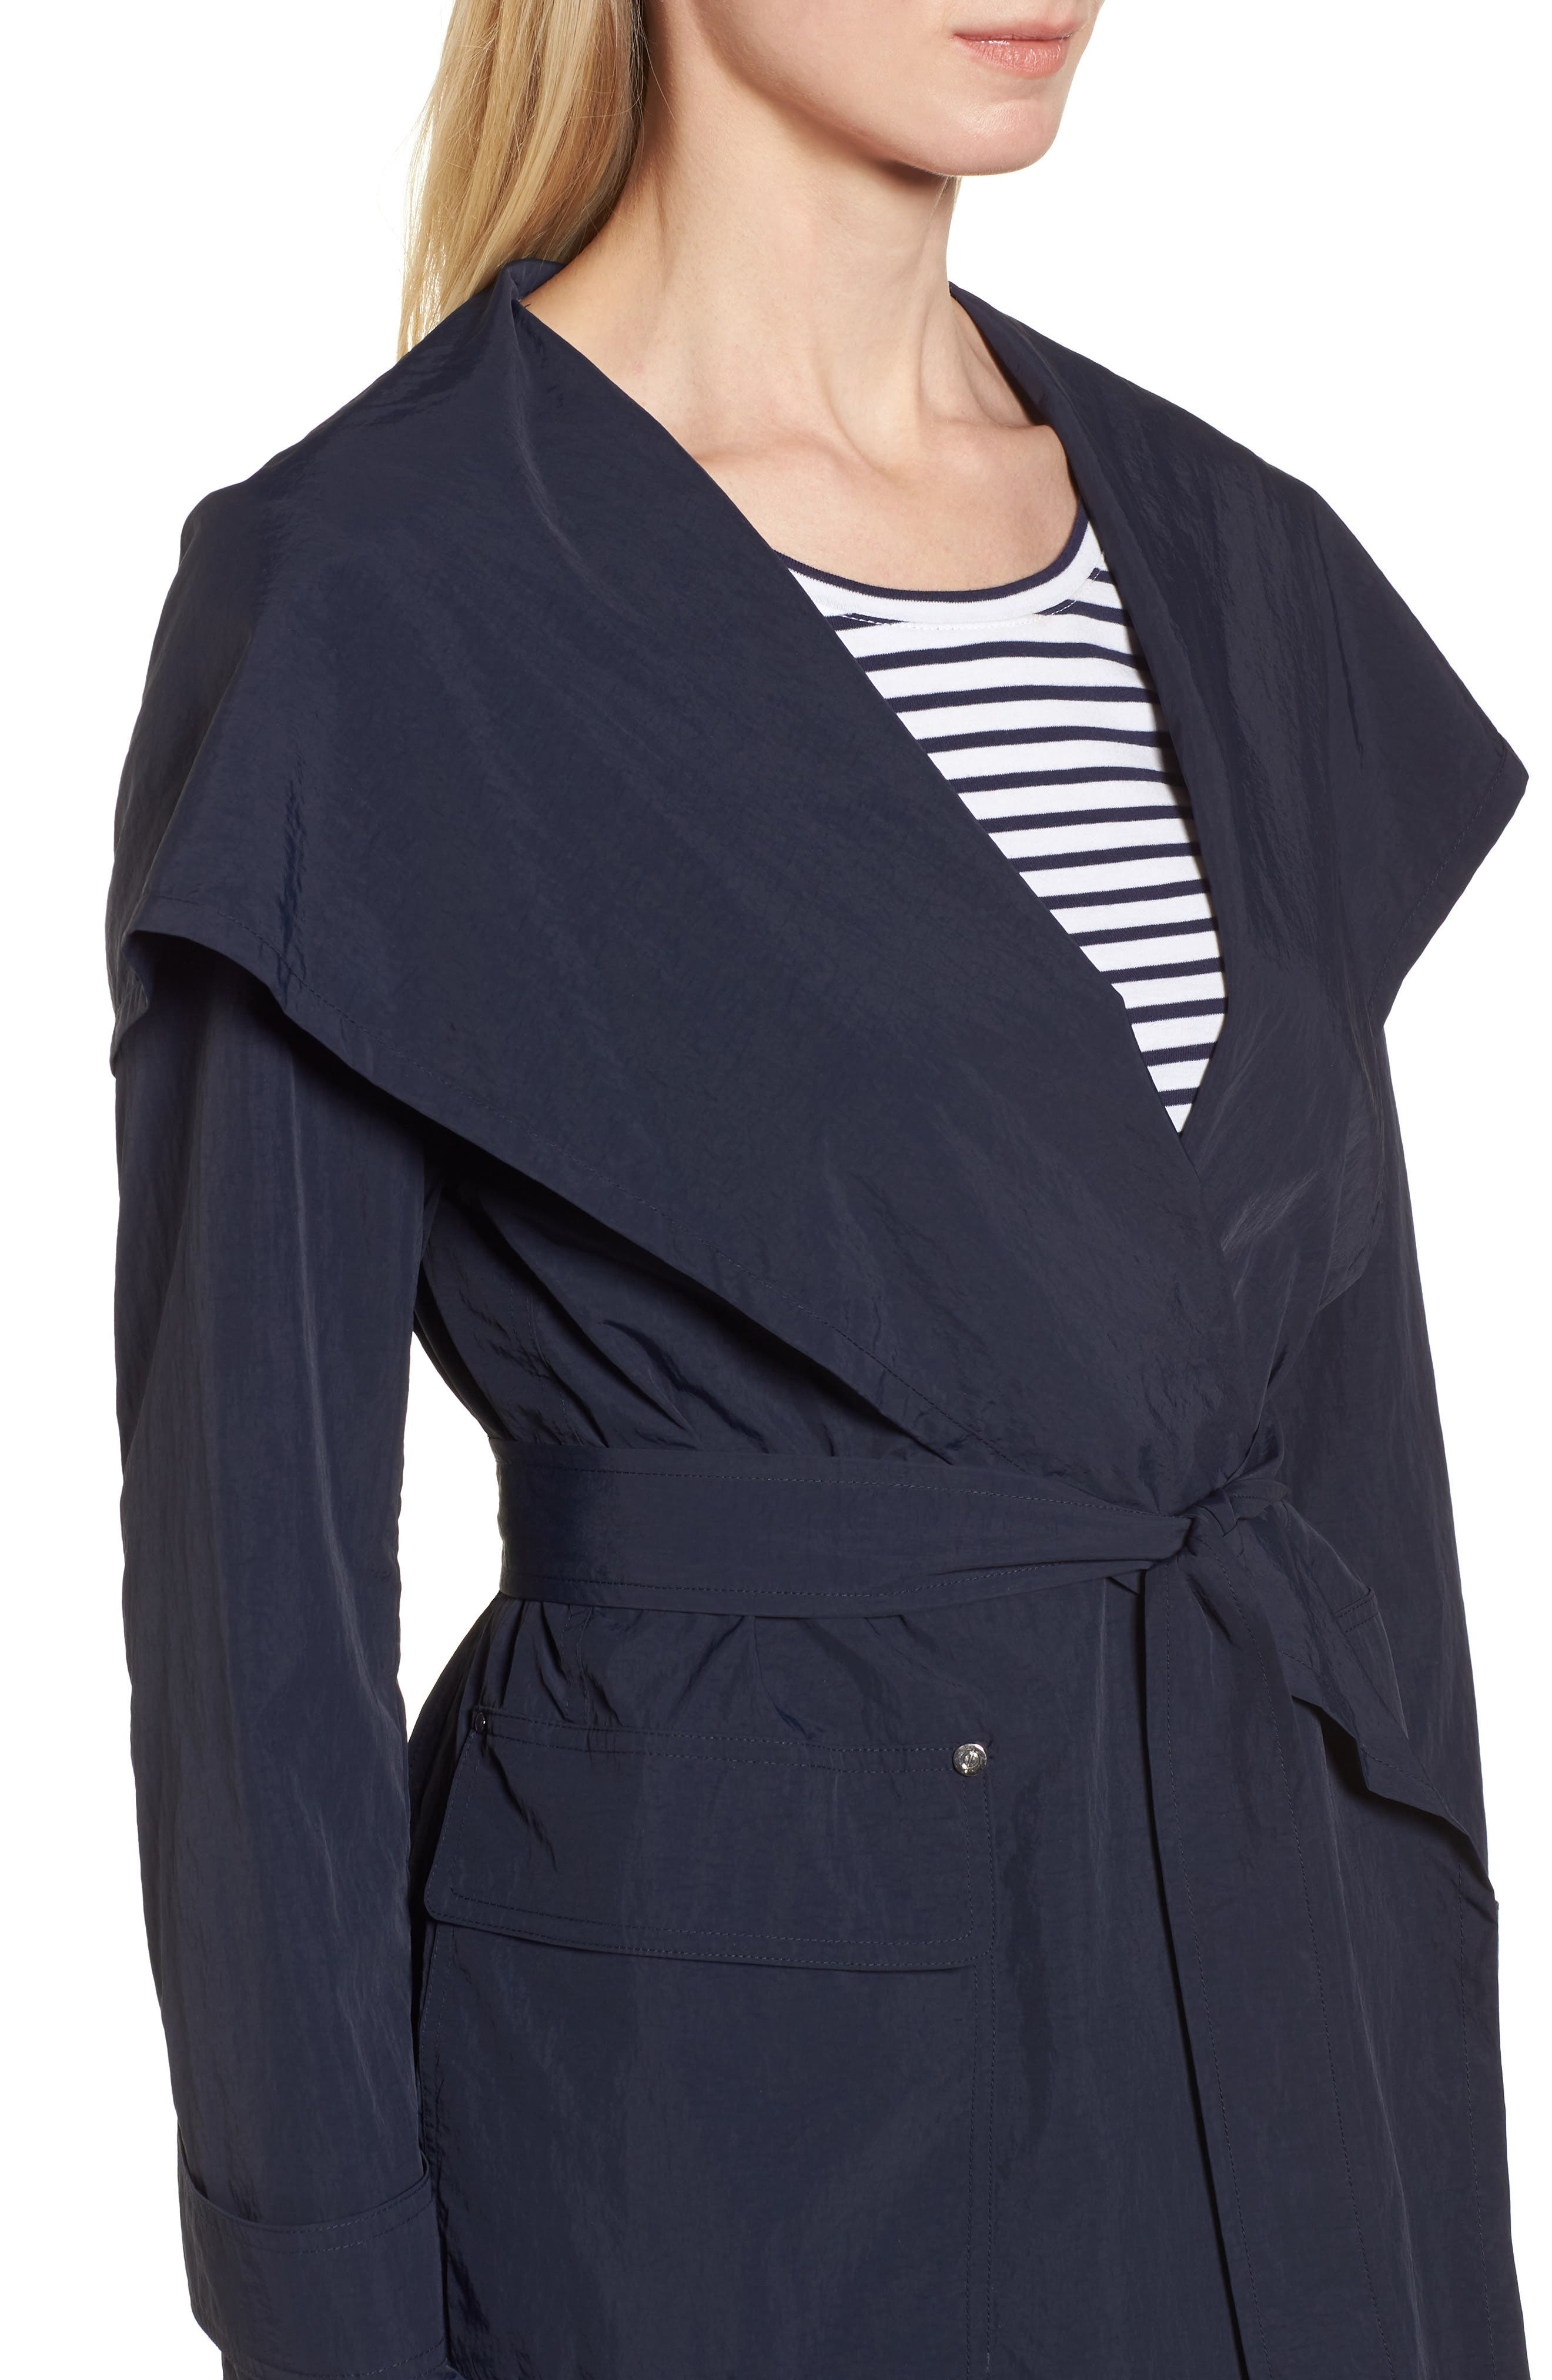 Flo Packable Hooded Raincoat,                             Alternate thumbnail 4, color,                             250